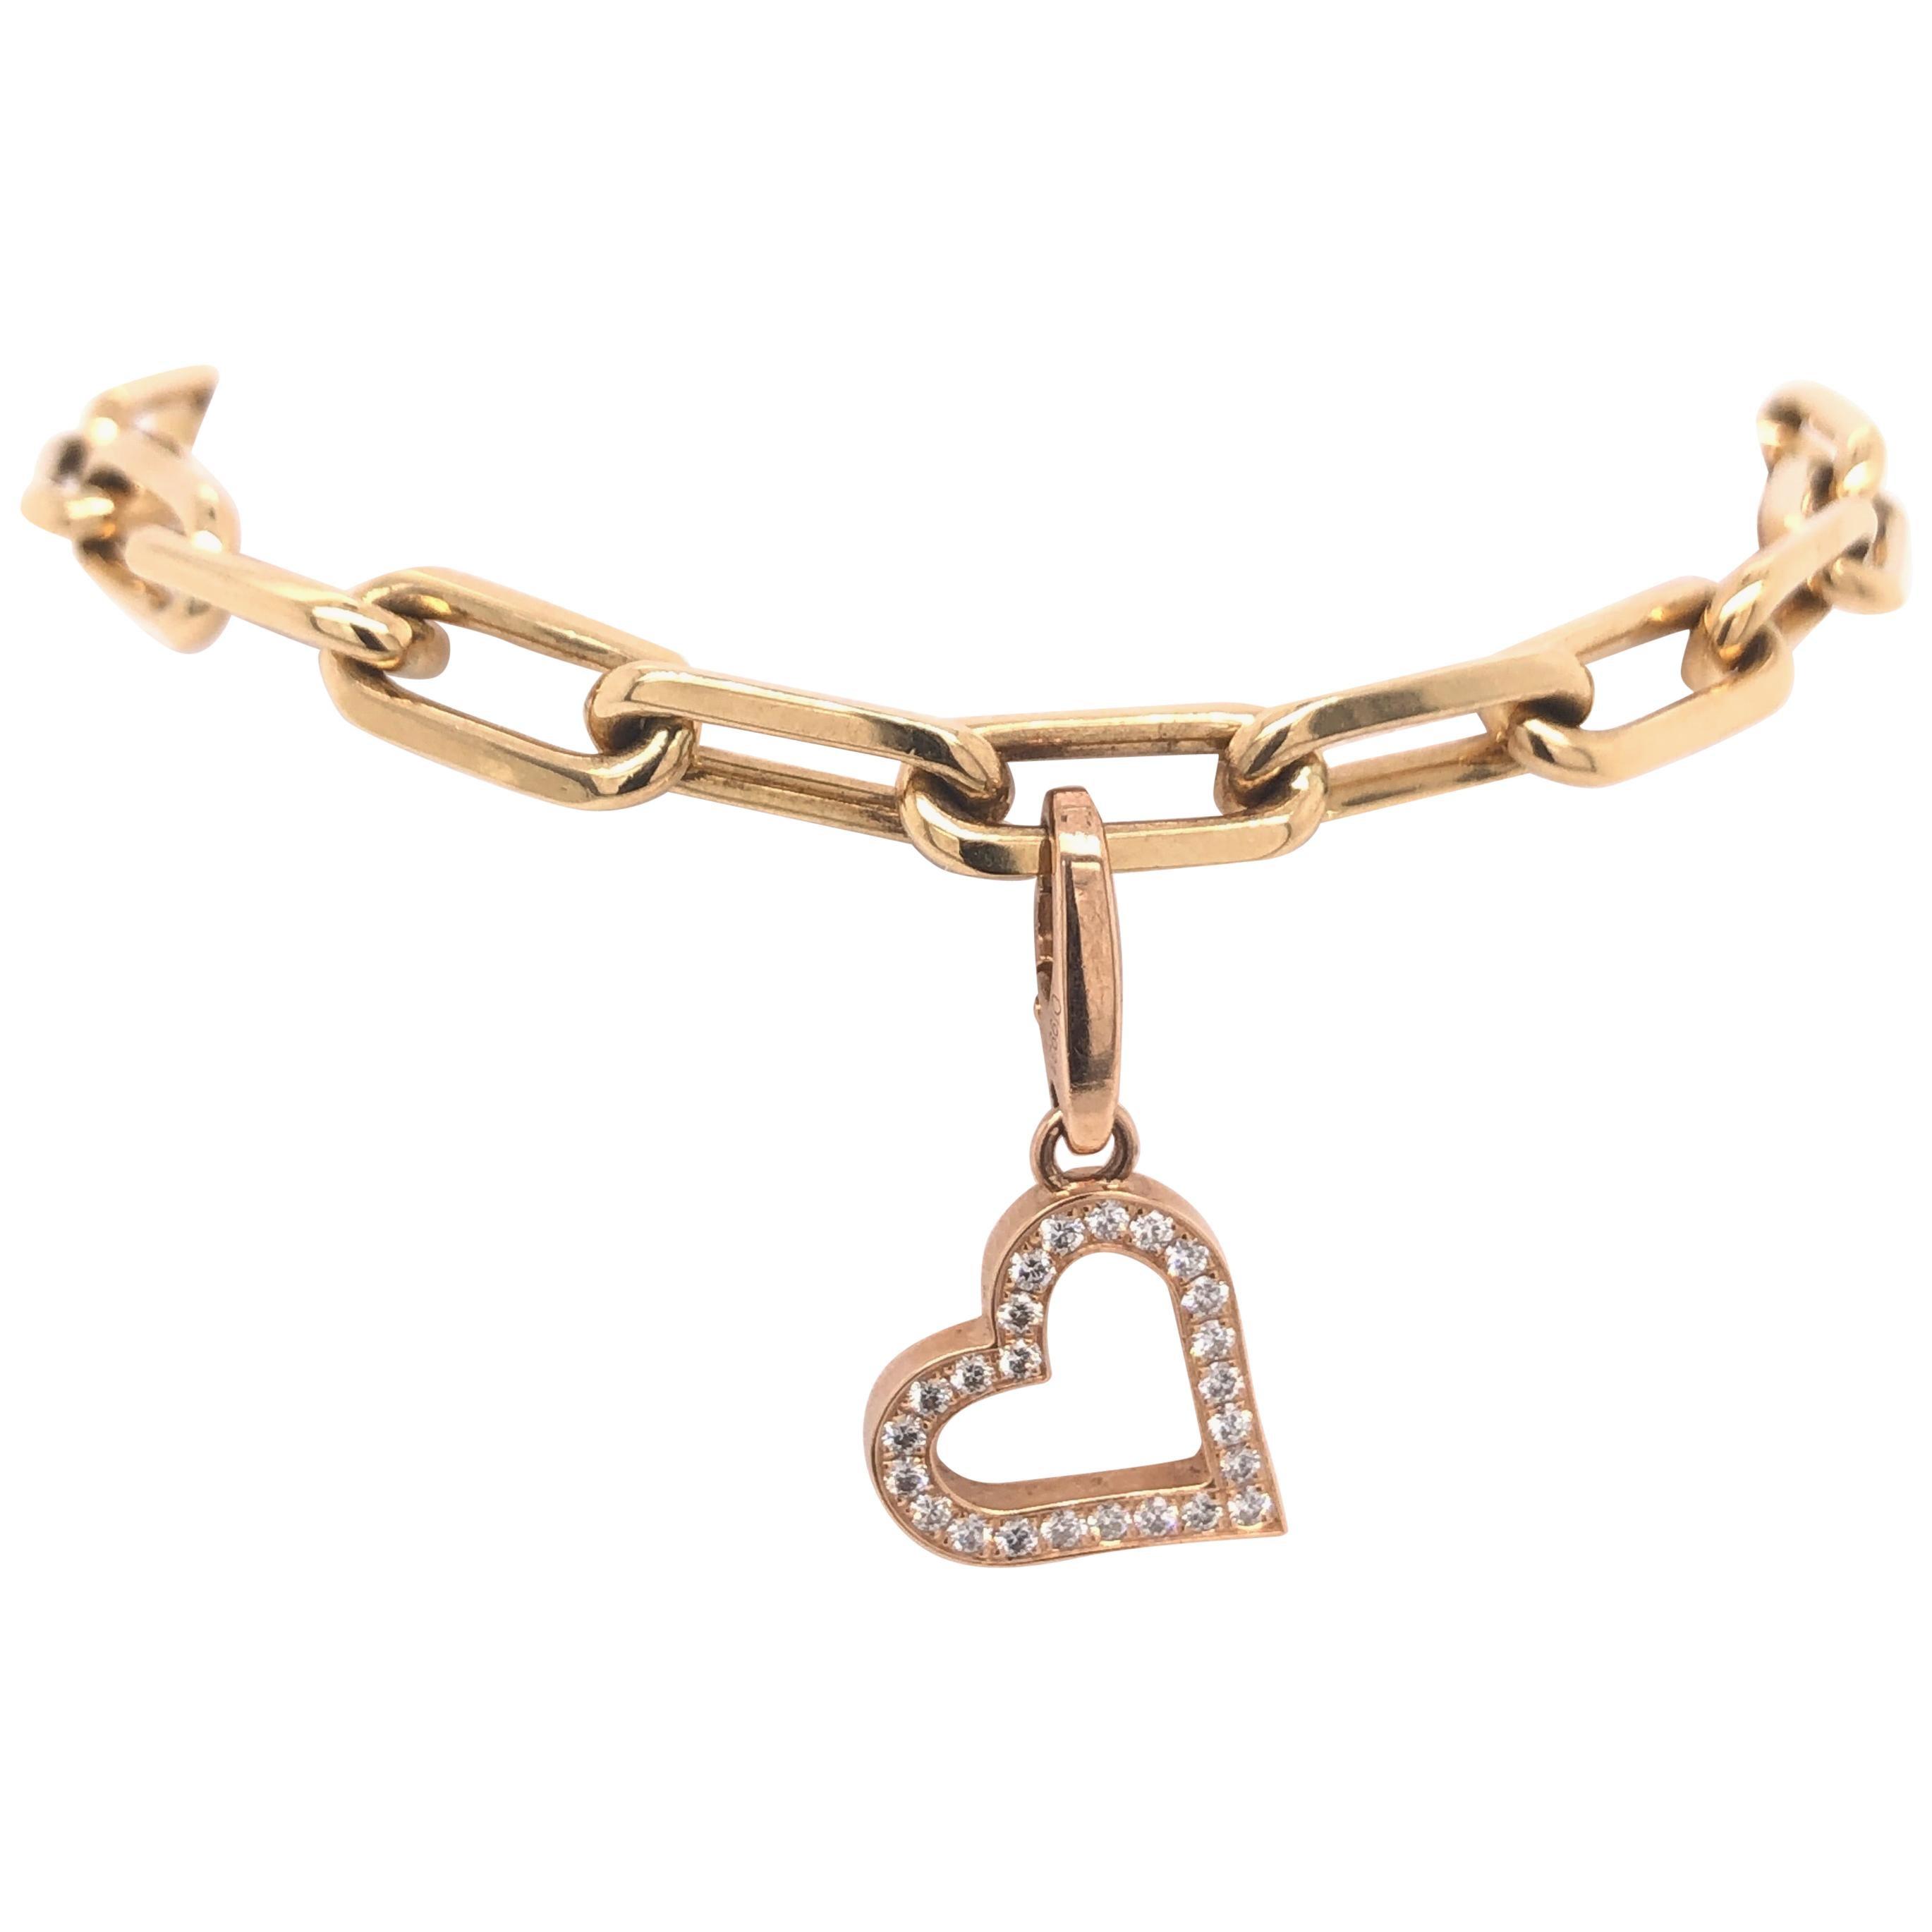 b0b795147db7a CARTIER Fidelity Yellow Gold Heart Key Bar Link Bracelet